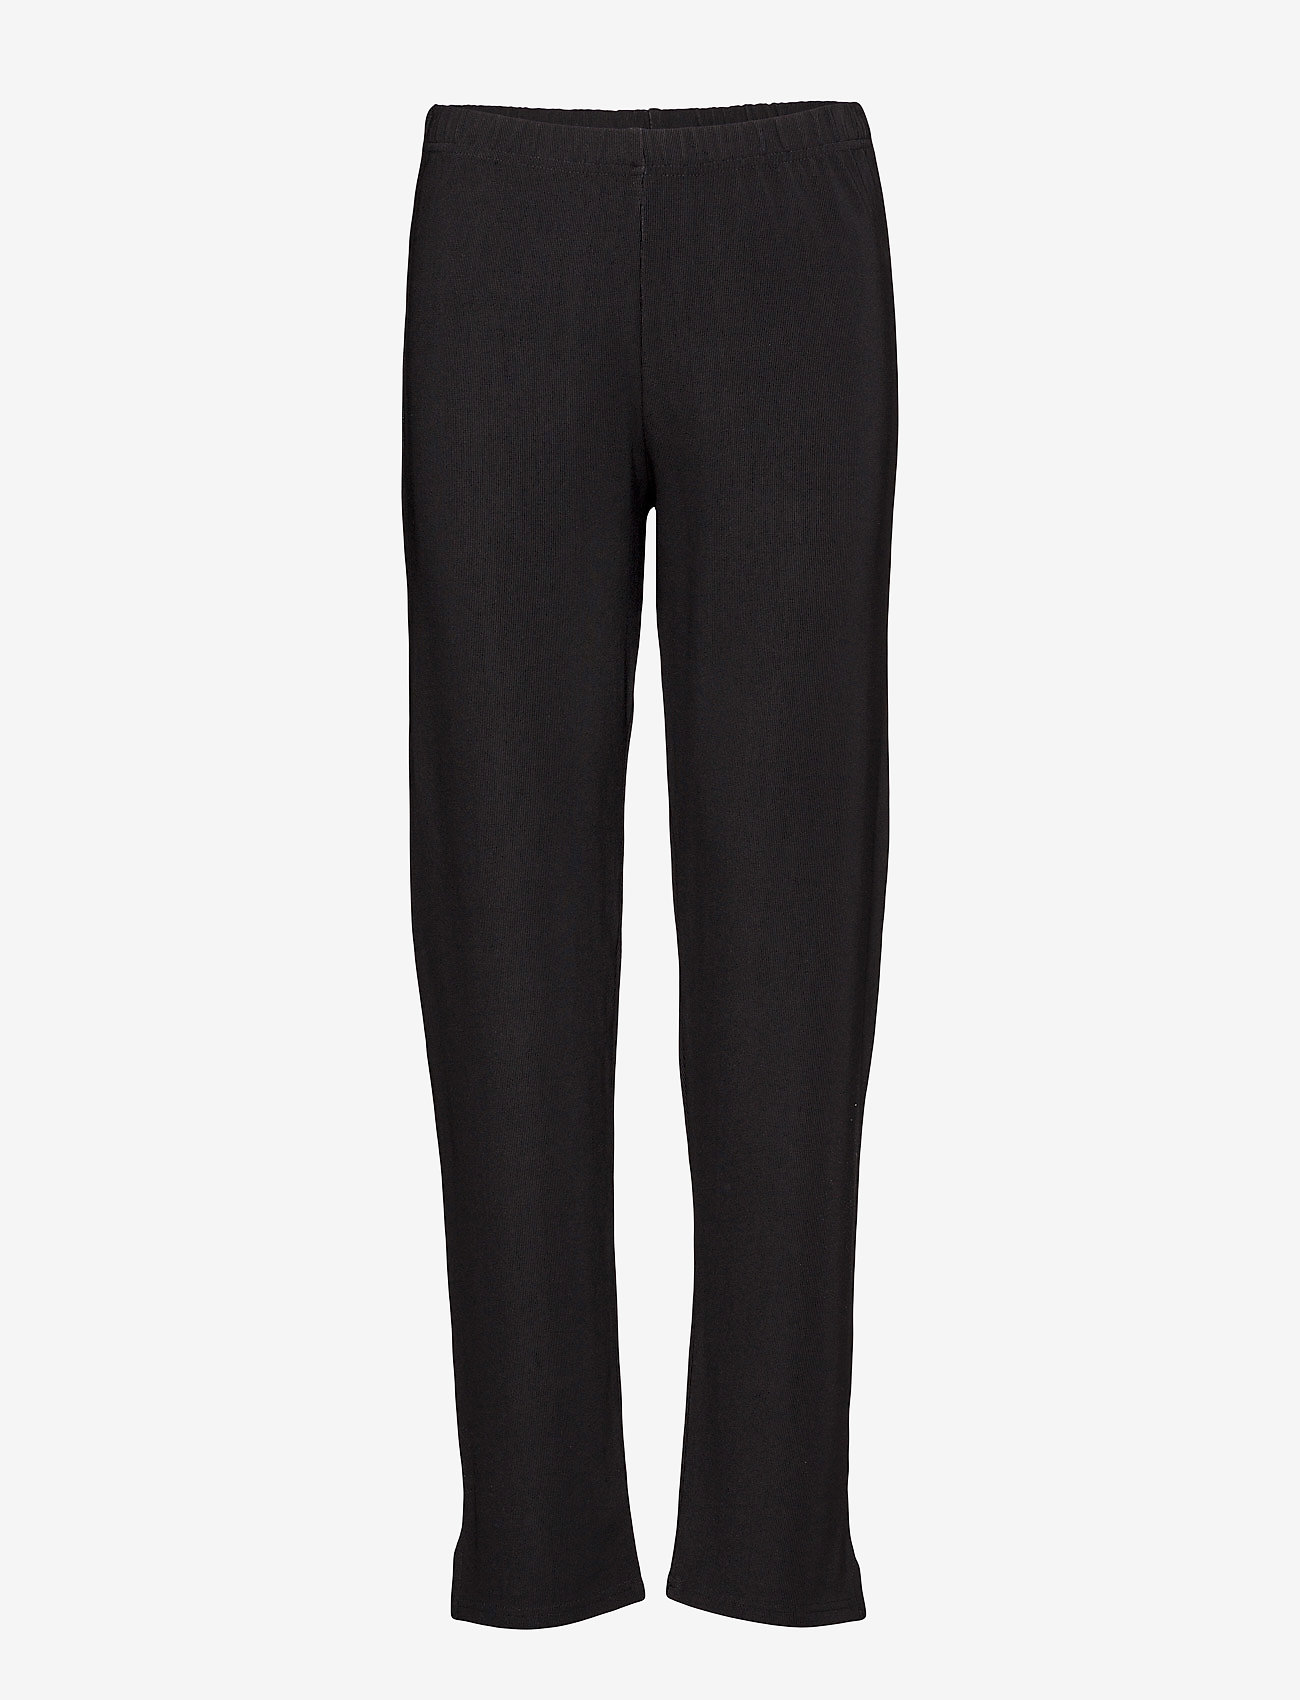 Masai - Priam - spodnie szerokie - black - 0